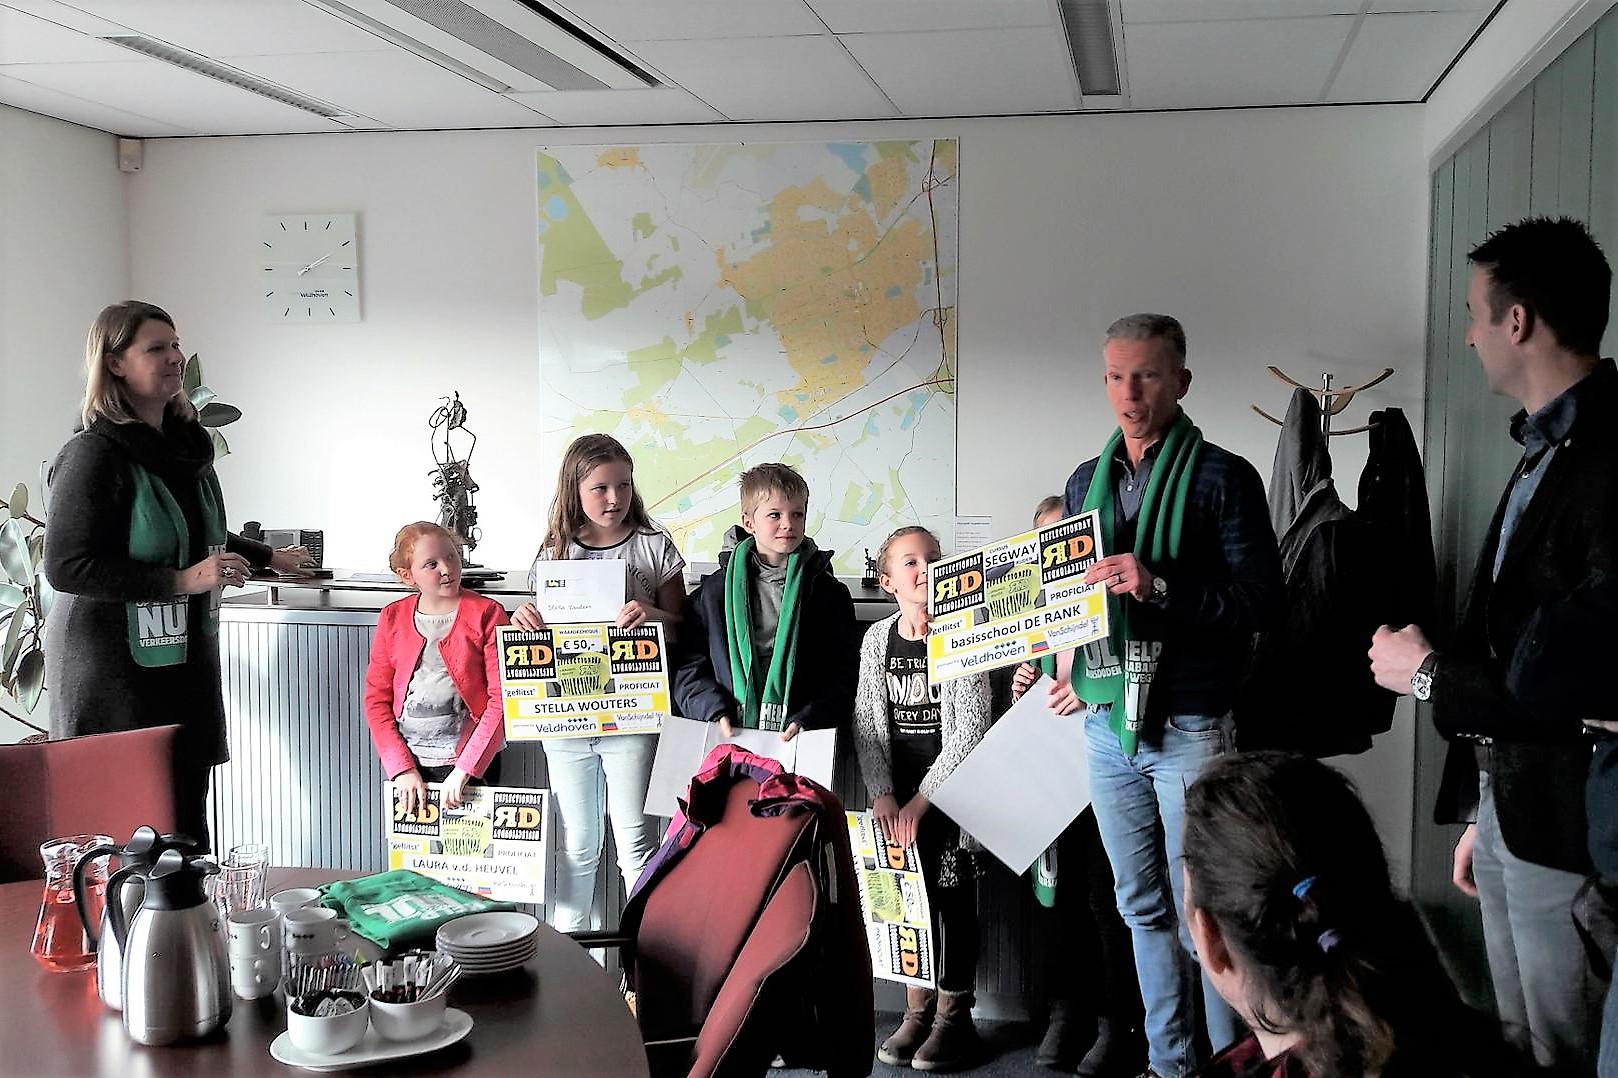 RD2016 Segway De Rank Veldhoven